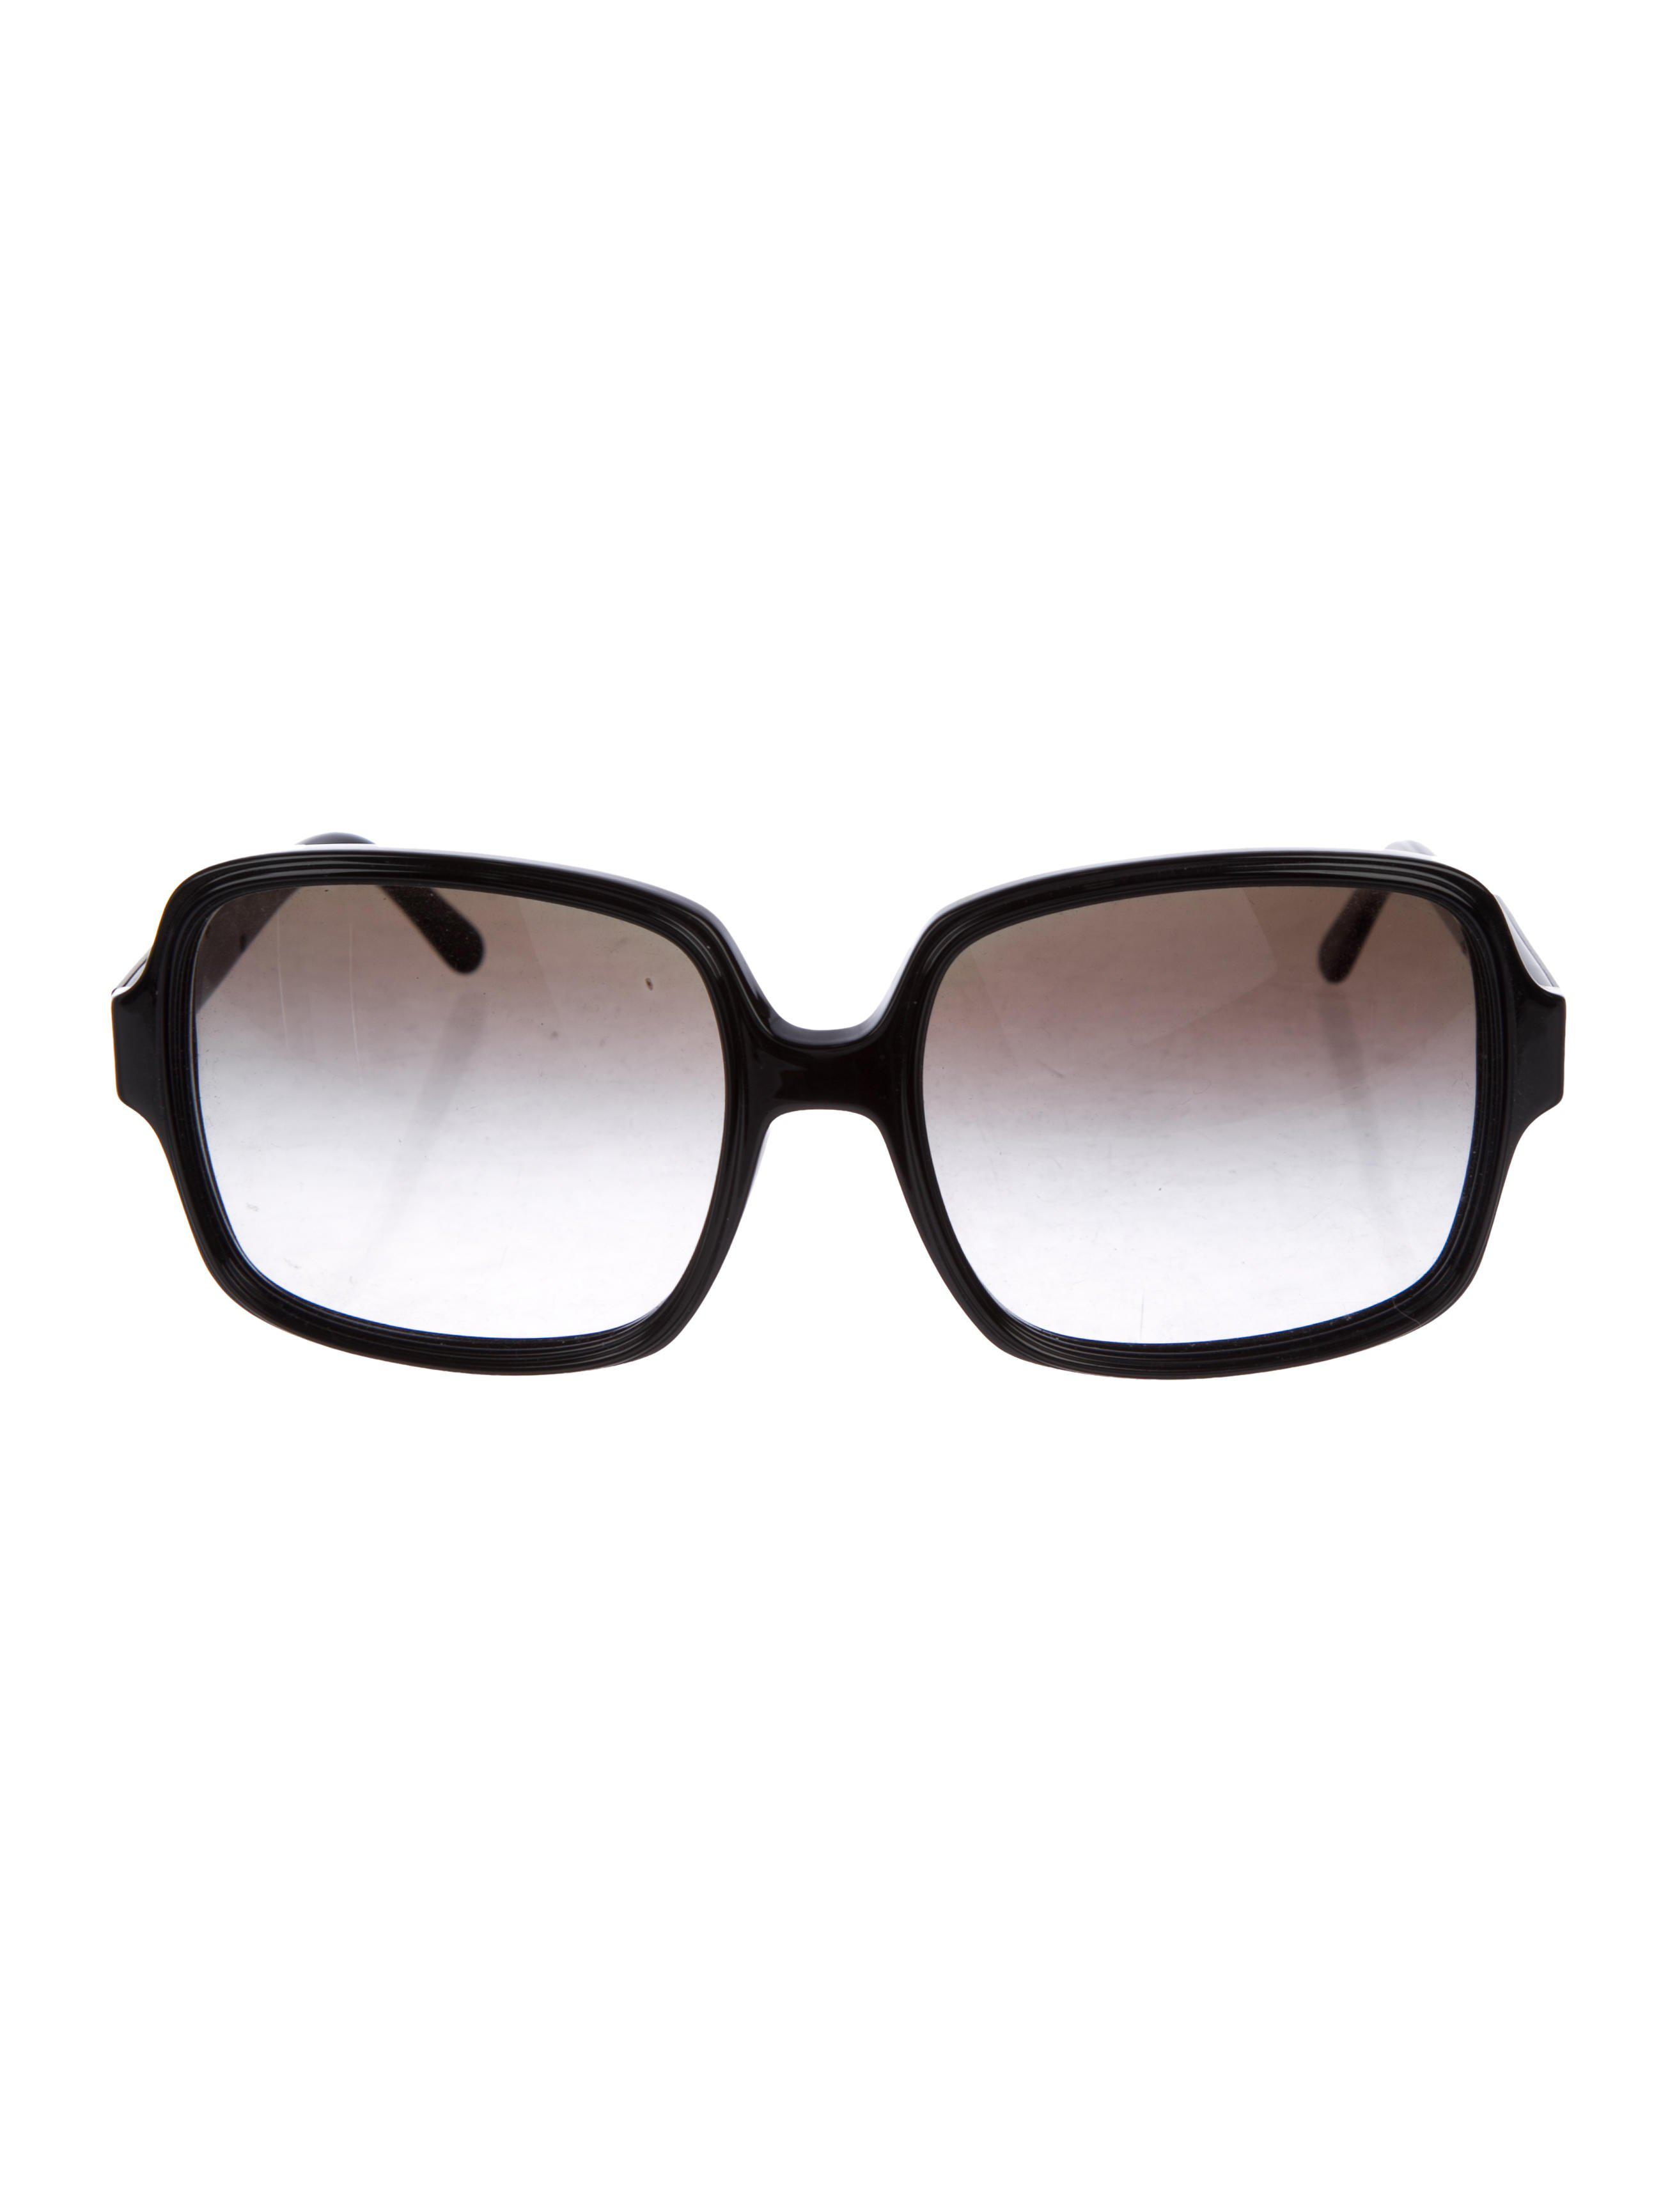 18387b1344 Lyst - Stella Mccartney Oversize Square Sunglasses in Black